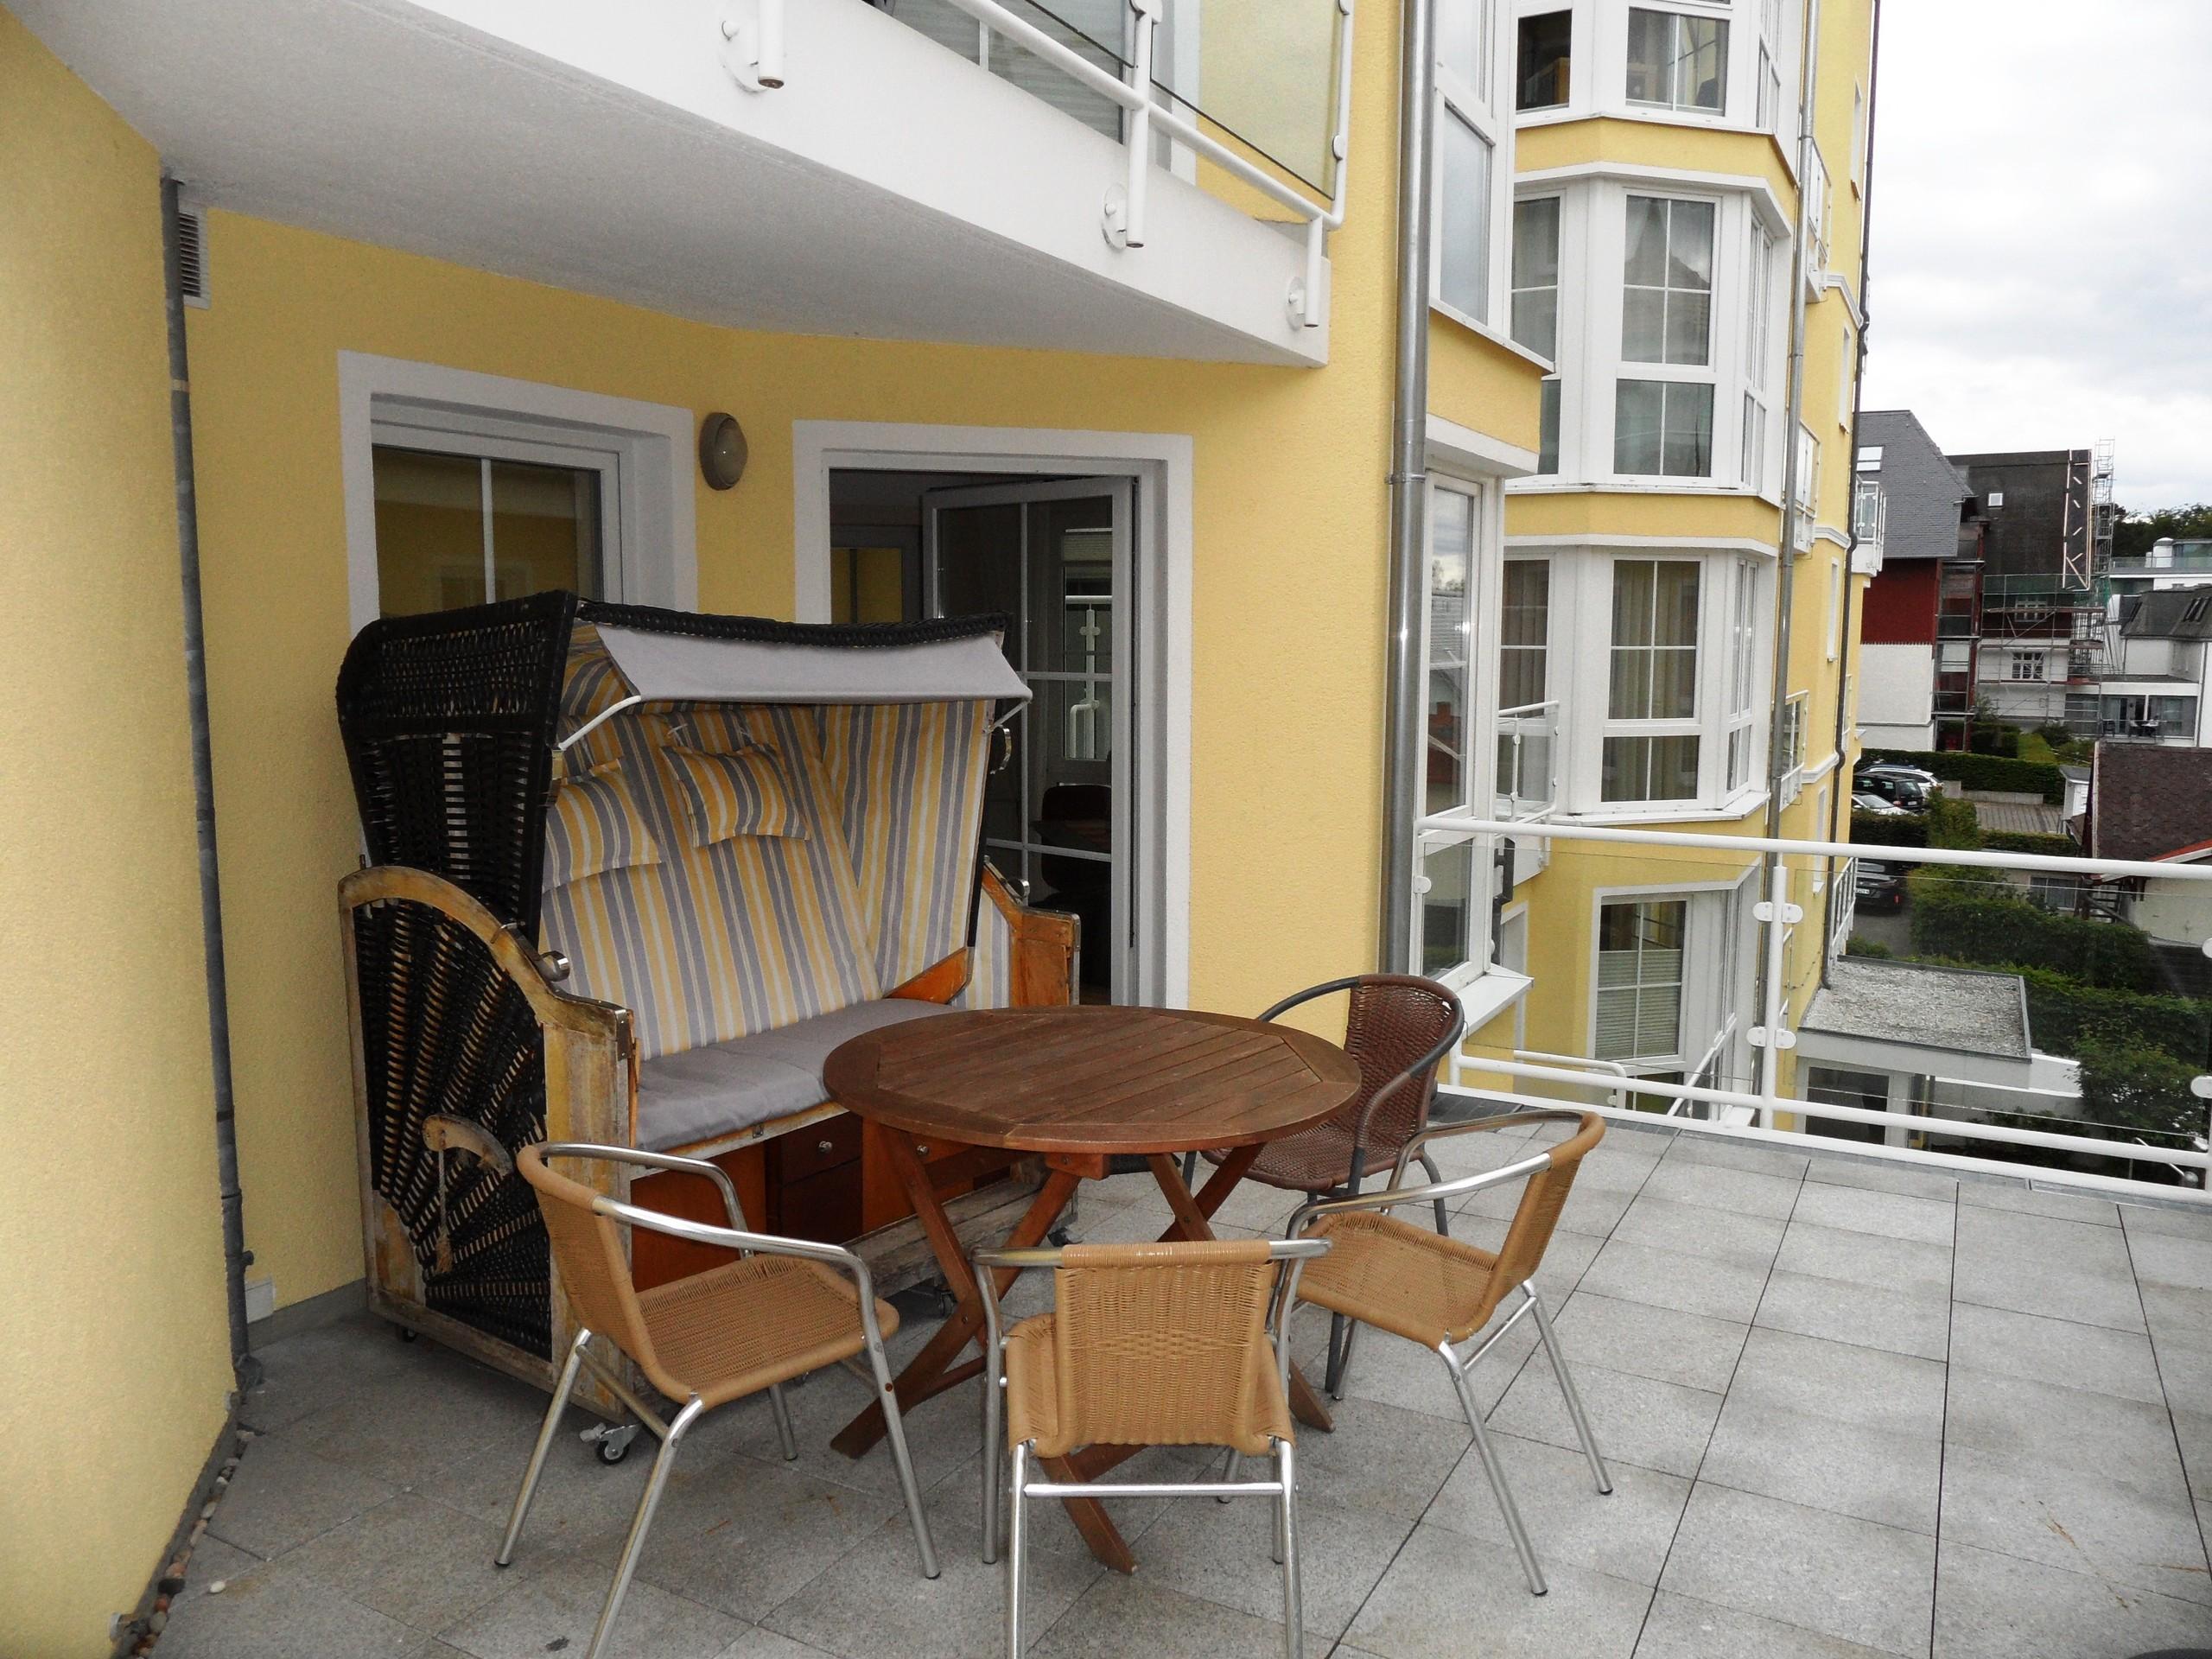 Terrasse inkl. Strandkorb